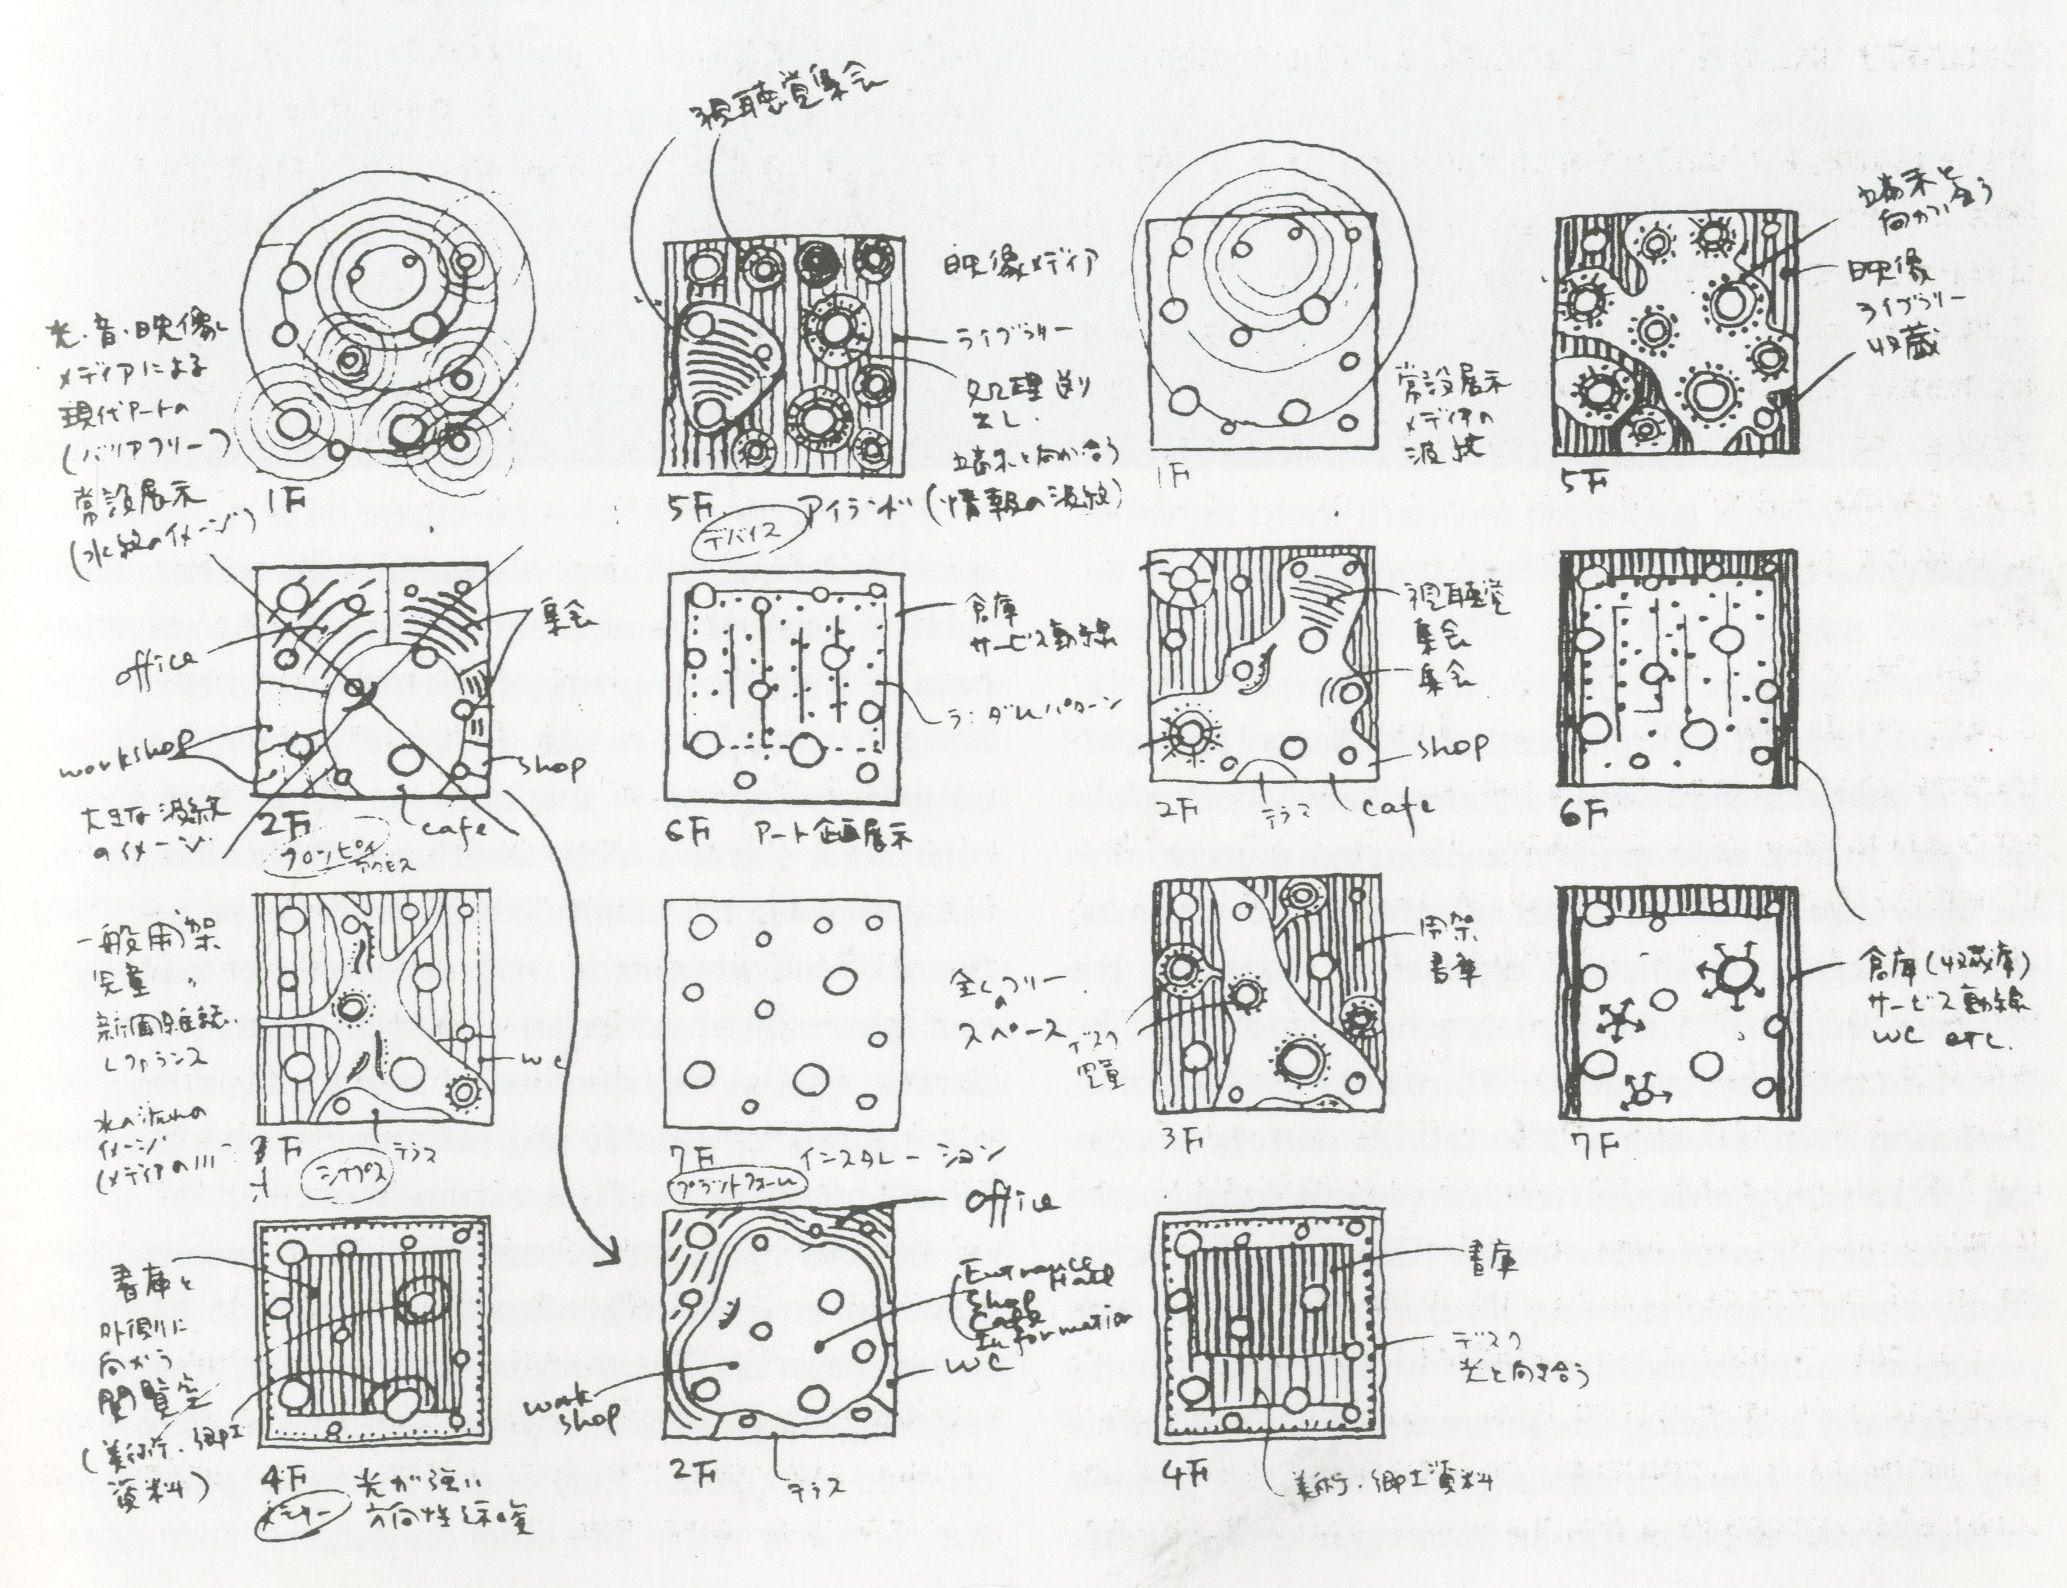 Pin By Huai Hsuan Shih On Plan